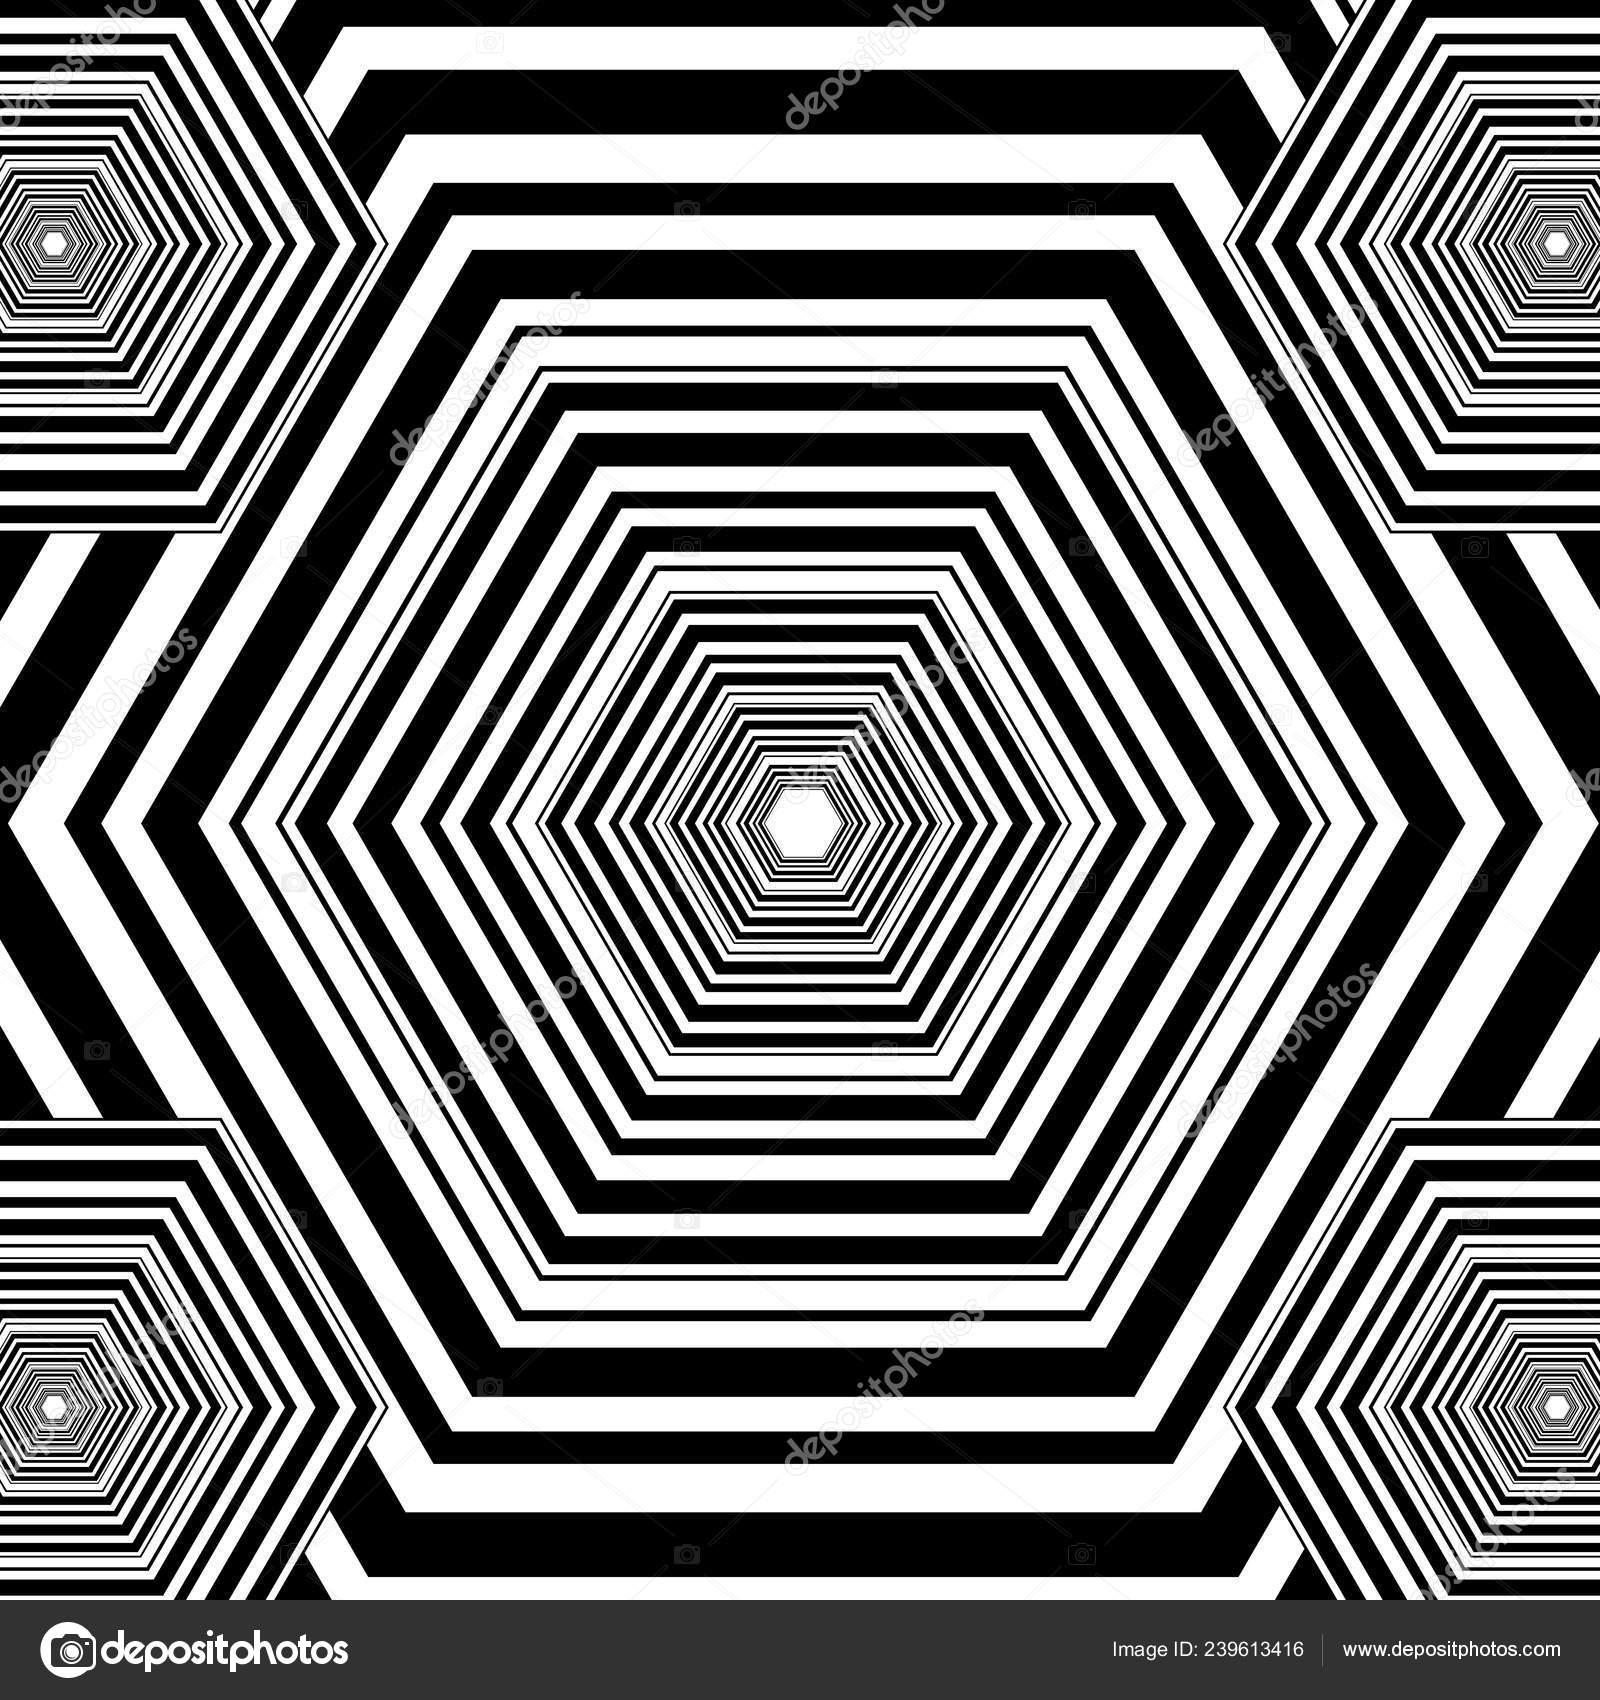 Disegni Geometrici Bianco E Nero disegni geometrici bianco e nero - disegni hd